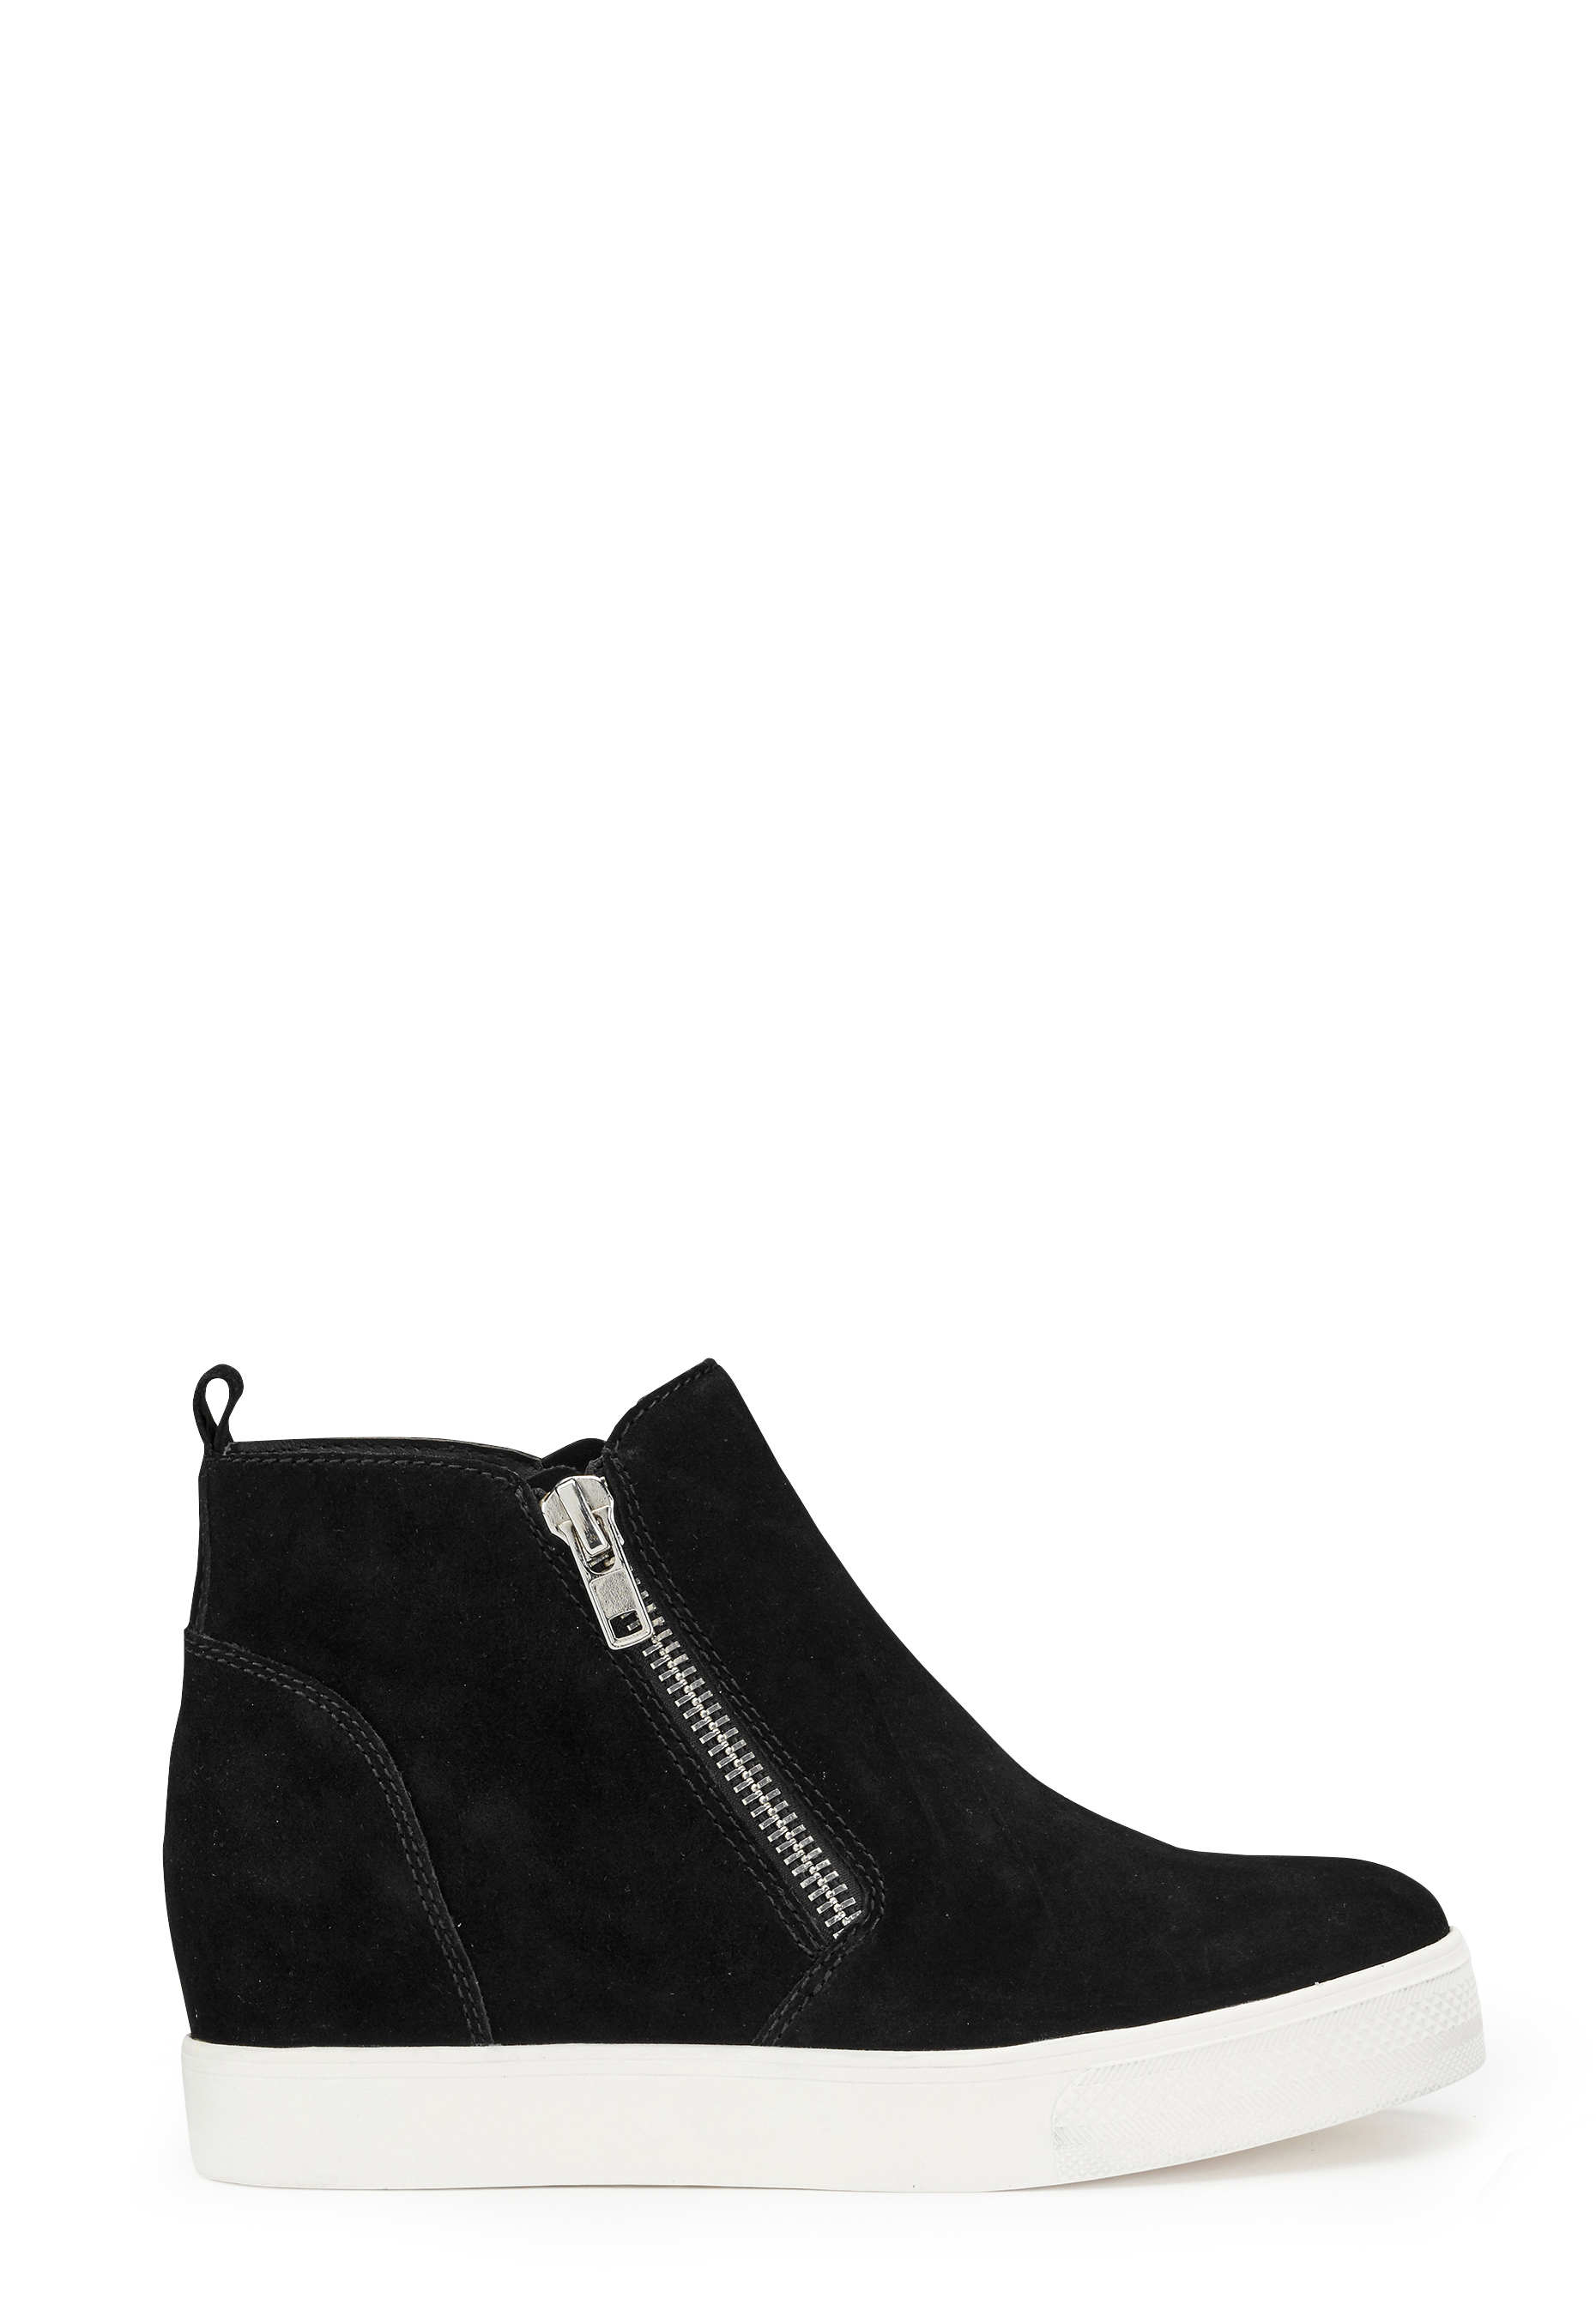 a493042a8dc Steve Madden Wedgie Sneaker Shoes Black Suede - Bubbleroom